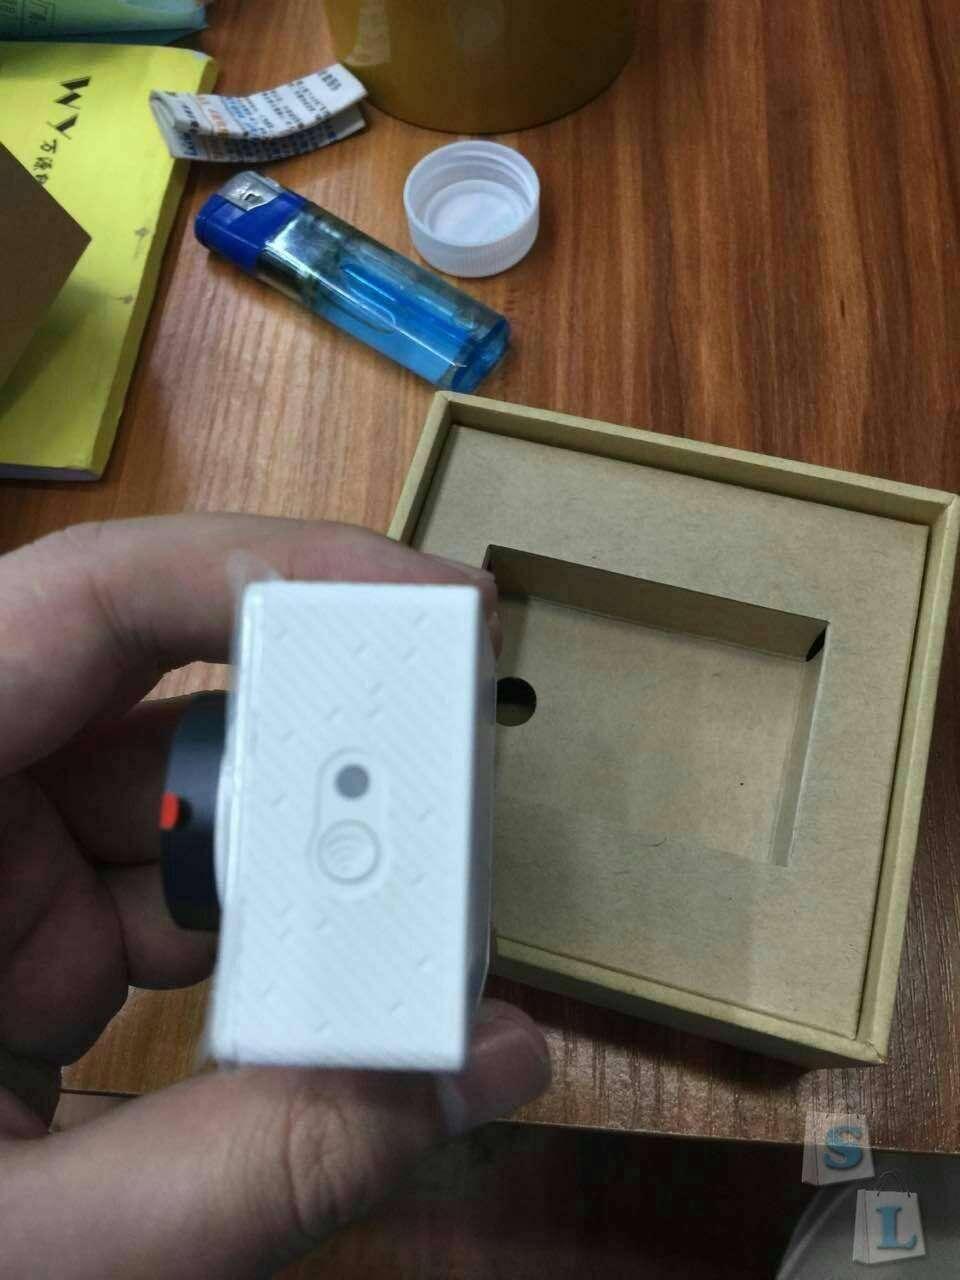 CooliCool: XIAOMI Sport Camera XIAOYI из coolicool